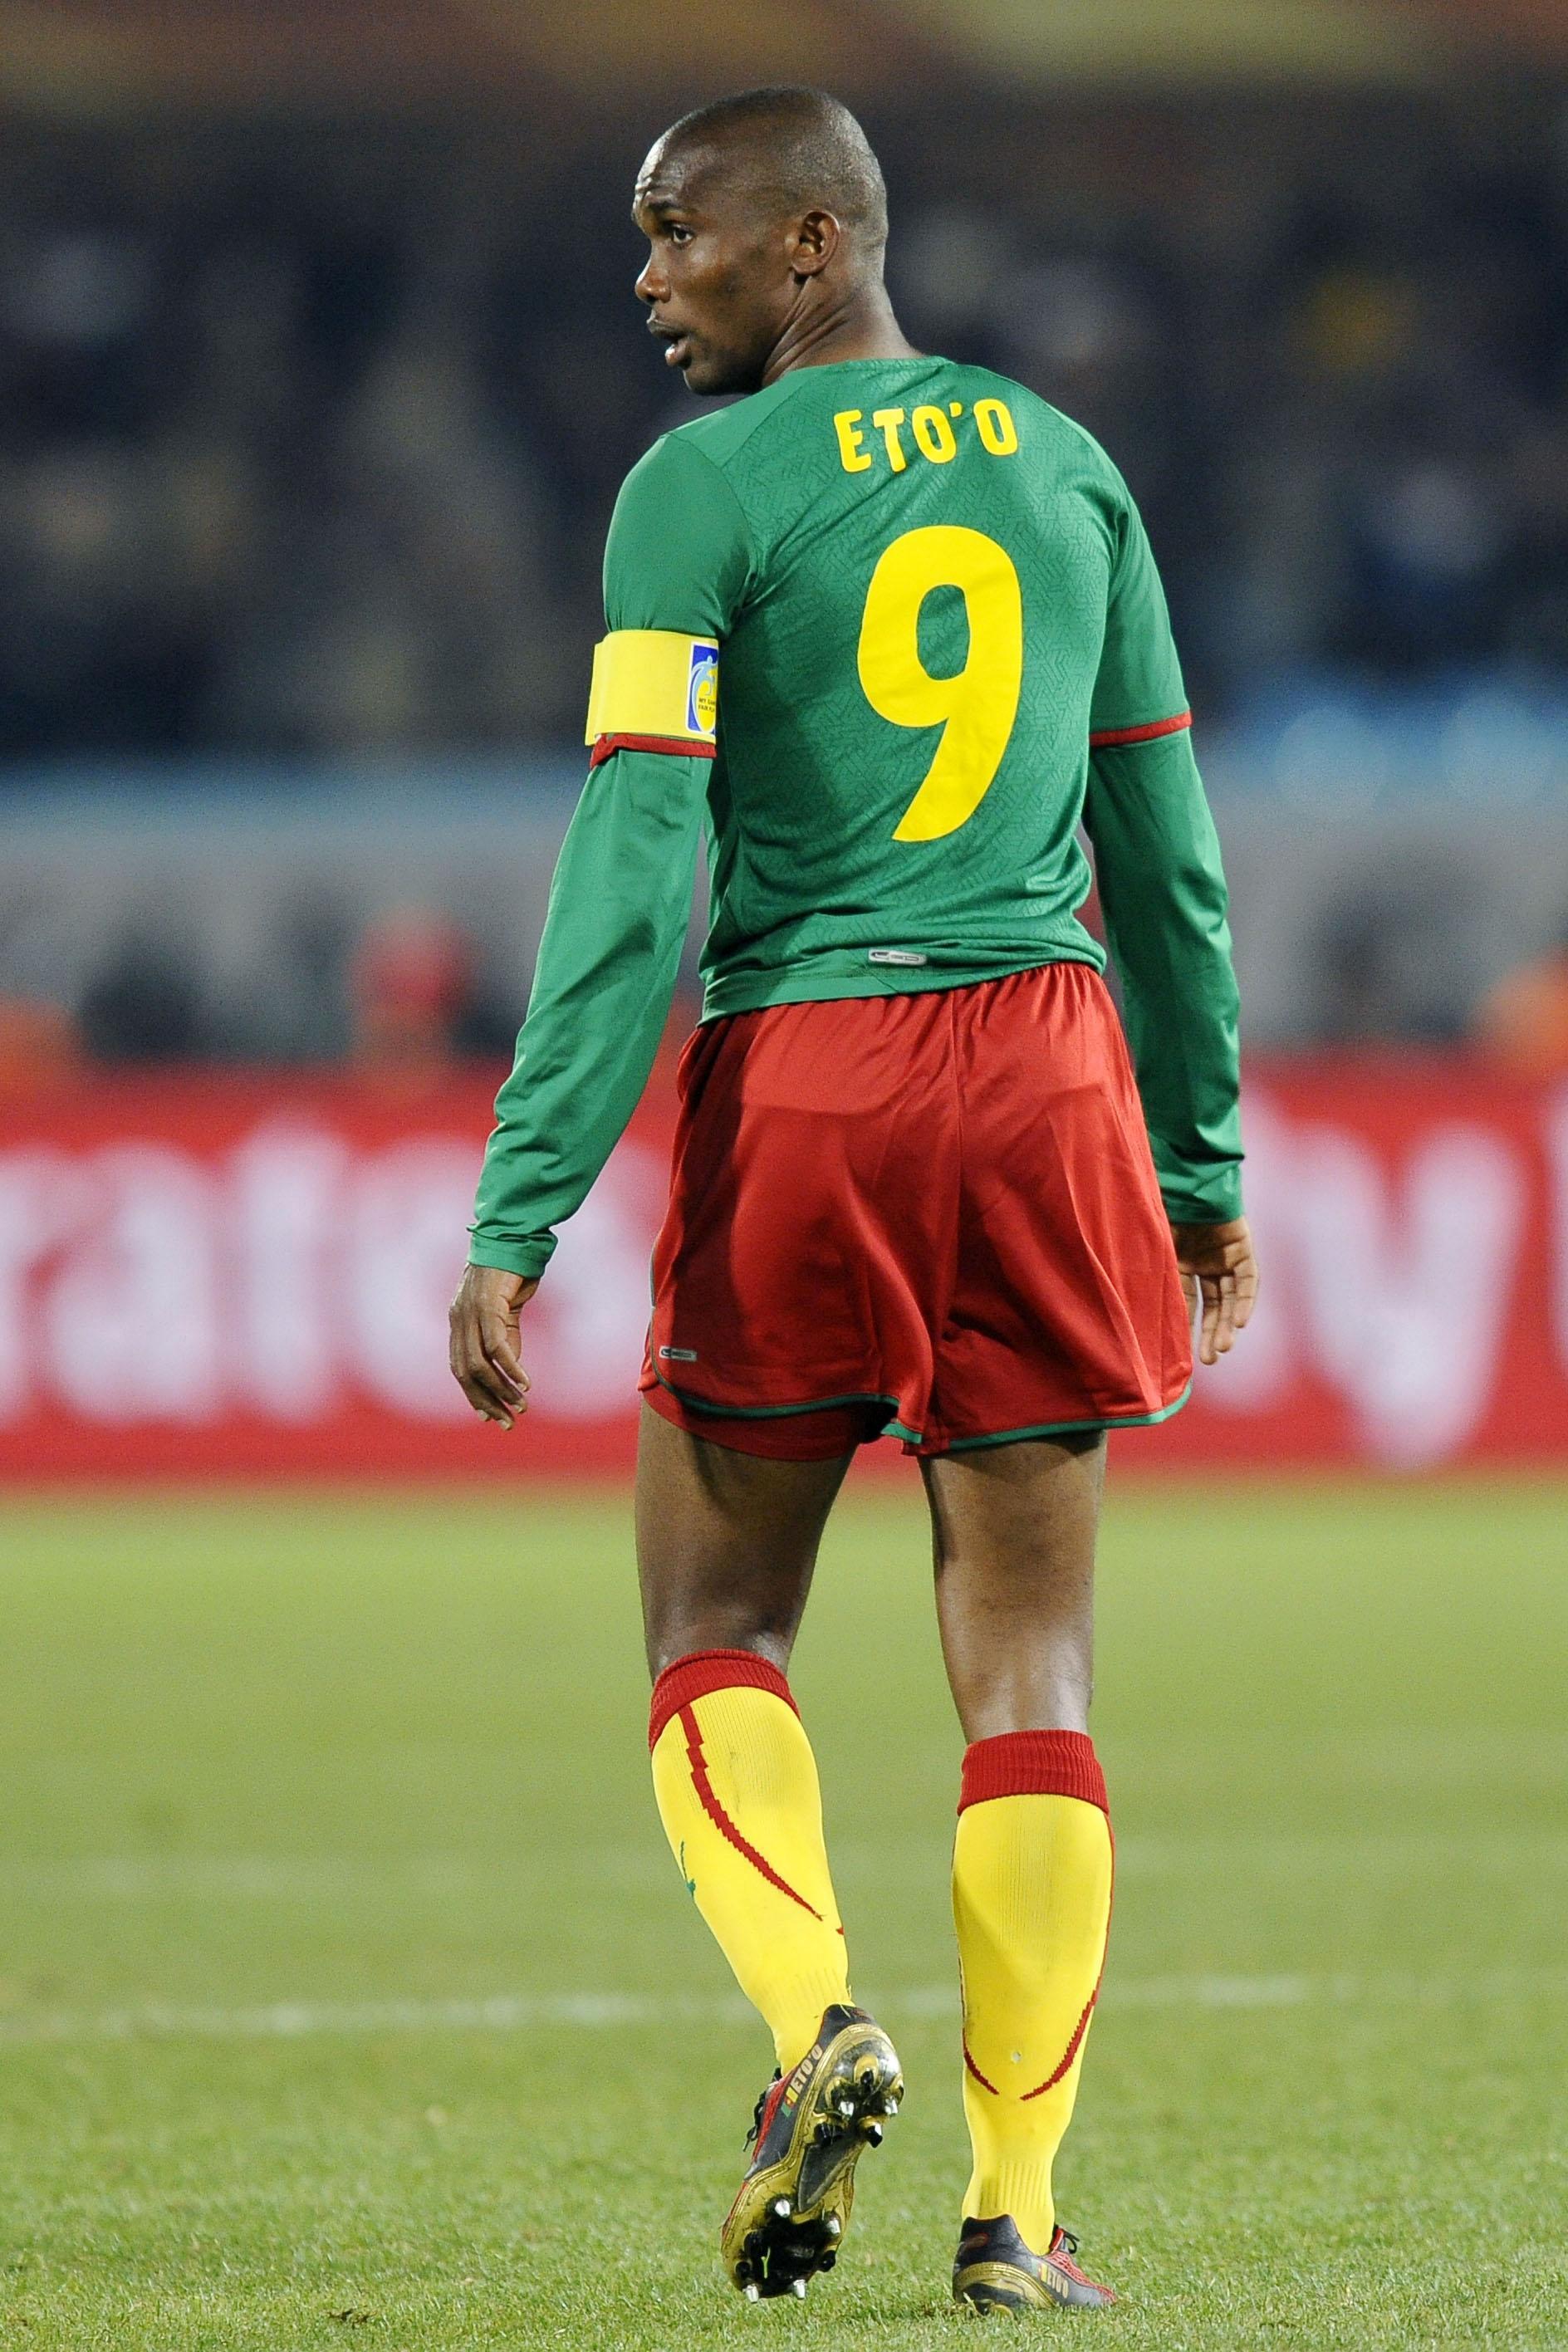 etoo-camerun-ifa